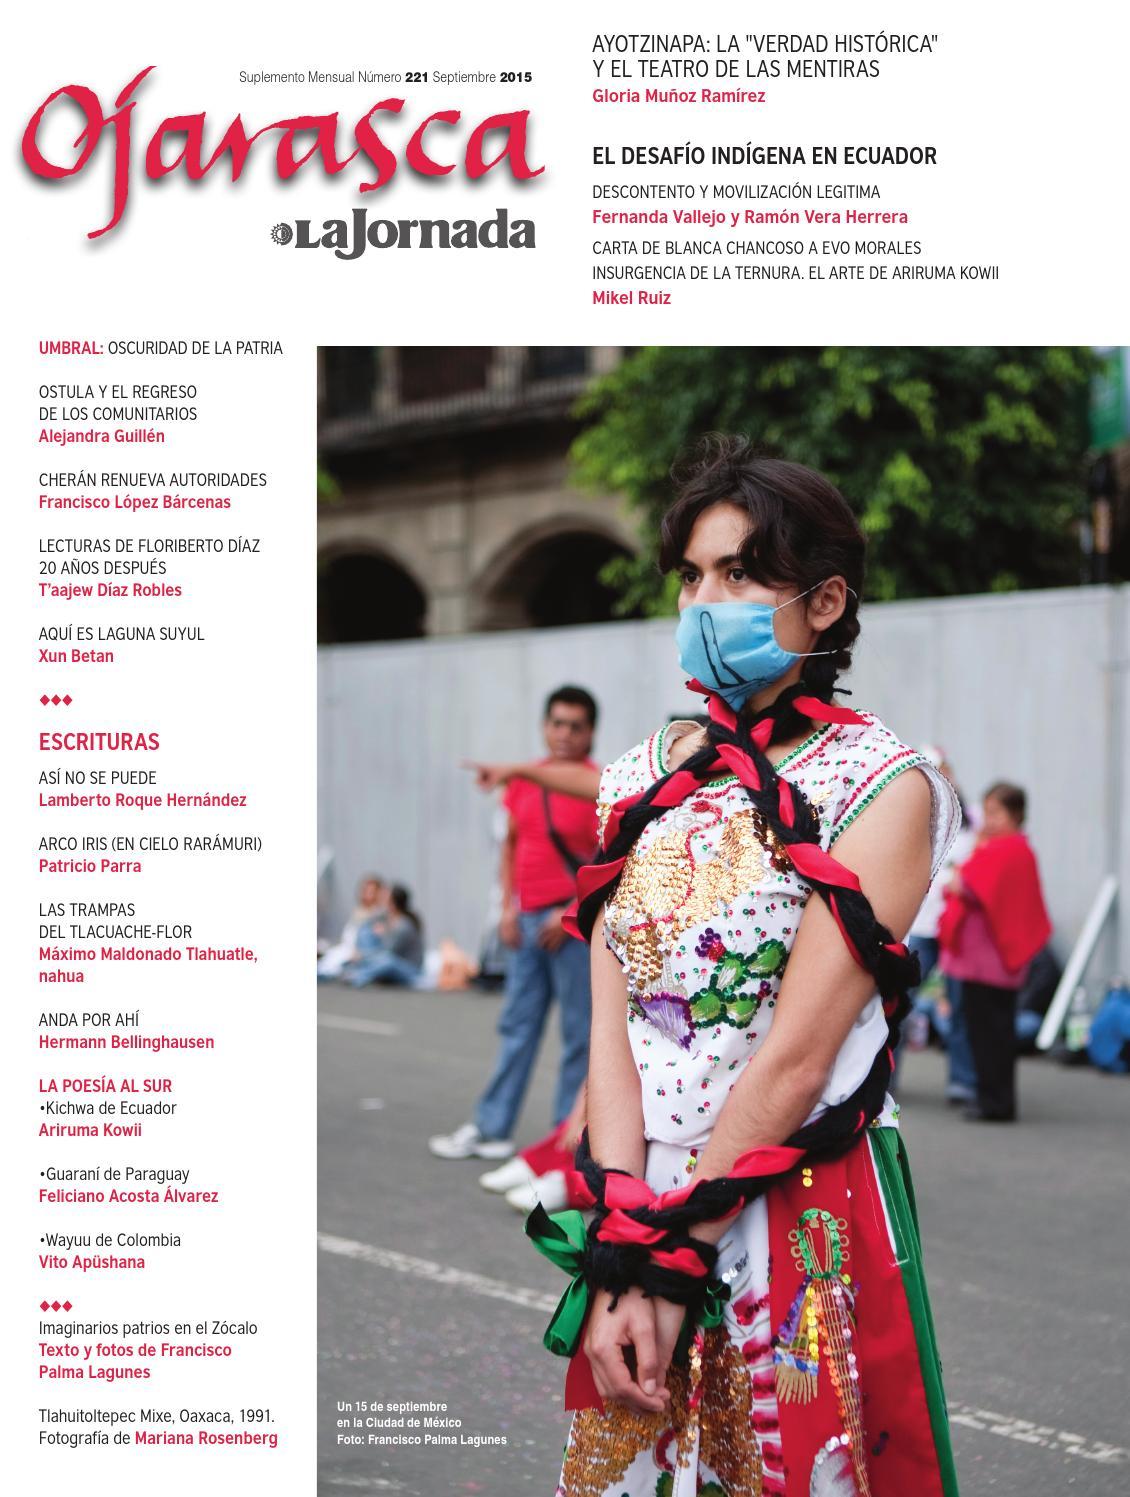 Ojarasca12092015 by La Jornada  DEMOS Desarrollo de Medios SA de CV - issuu 7c72d0ebcc7